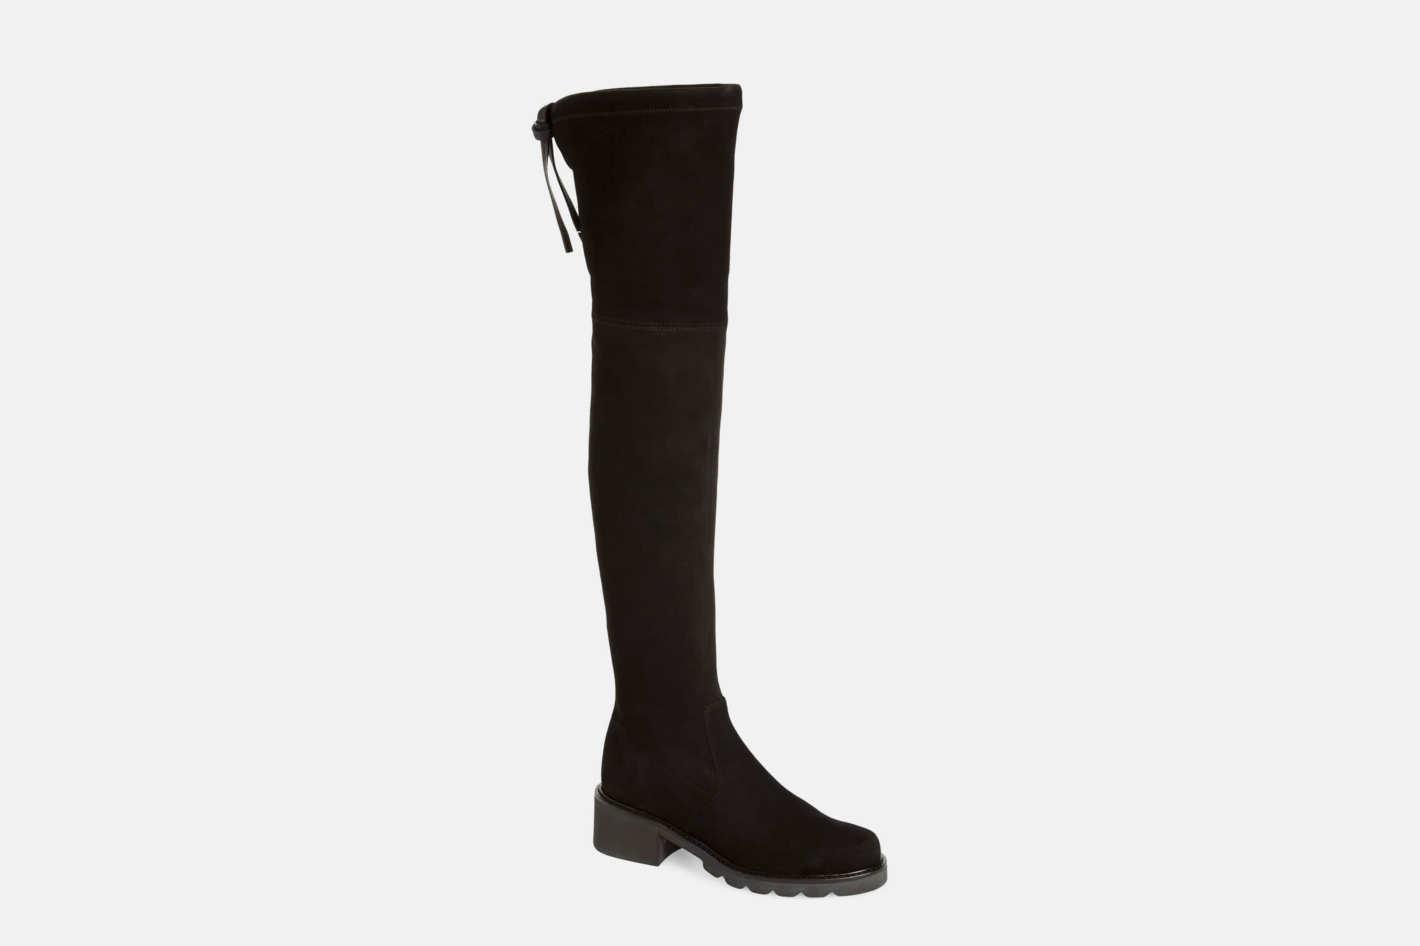 ca31fc55199 Stuart Weitzman Eldridge Over the Knee Boot WOMEN39S FASHION